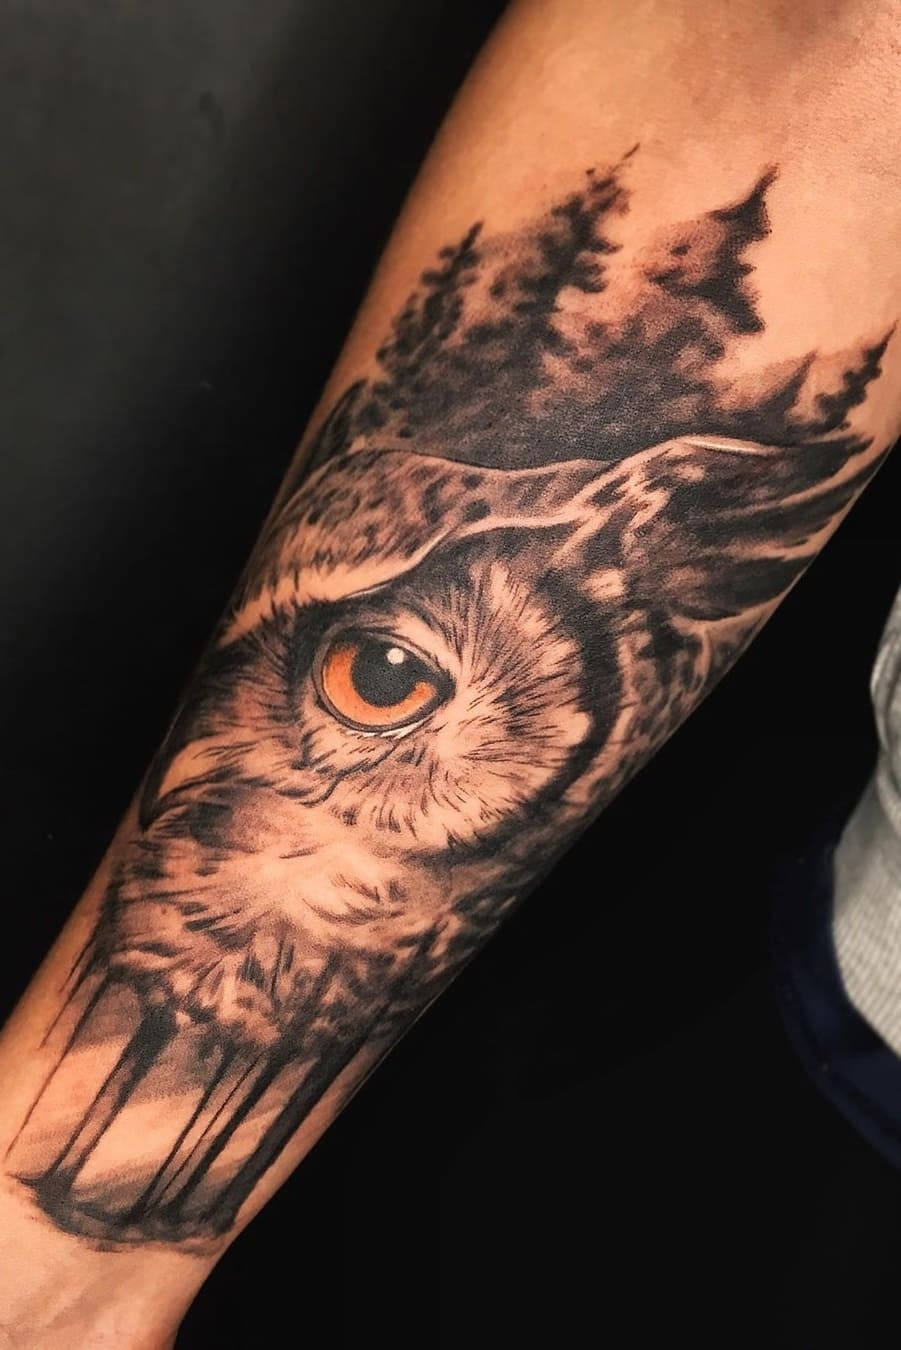 tatuagem-de-coruja-2020-5